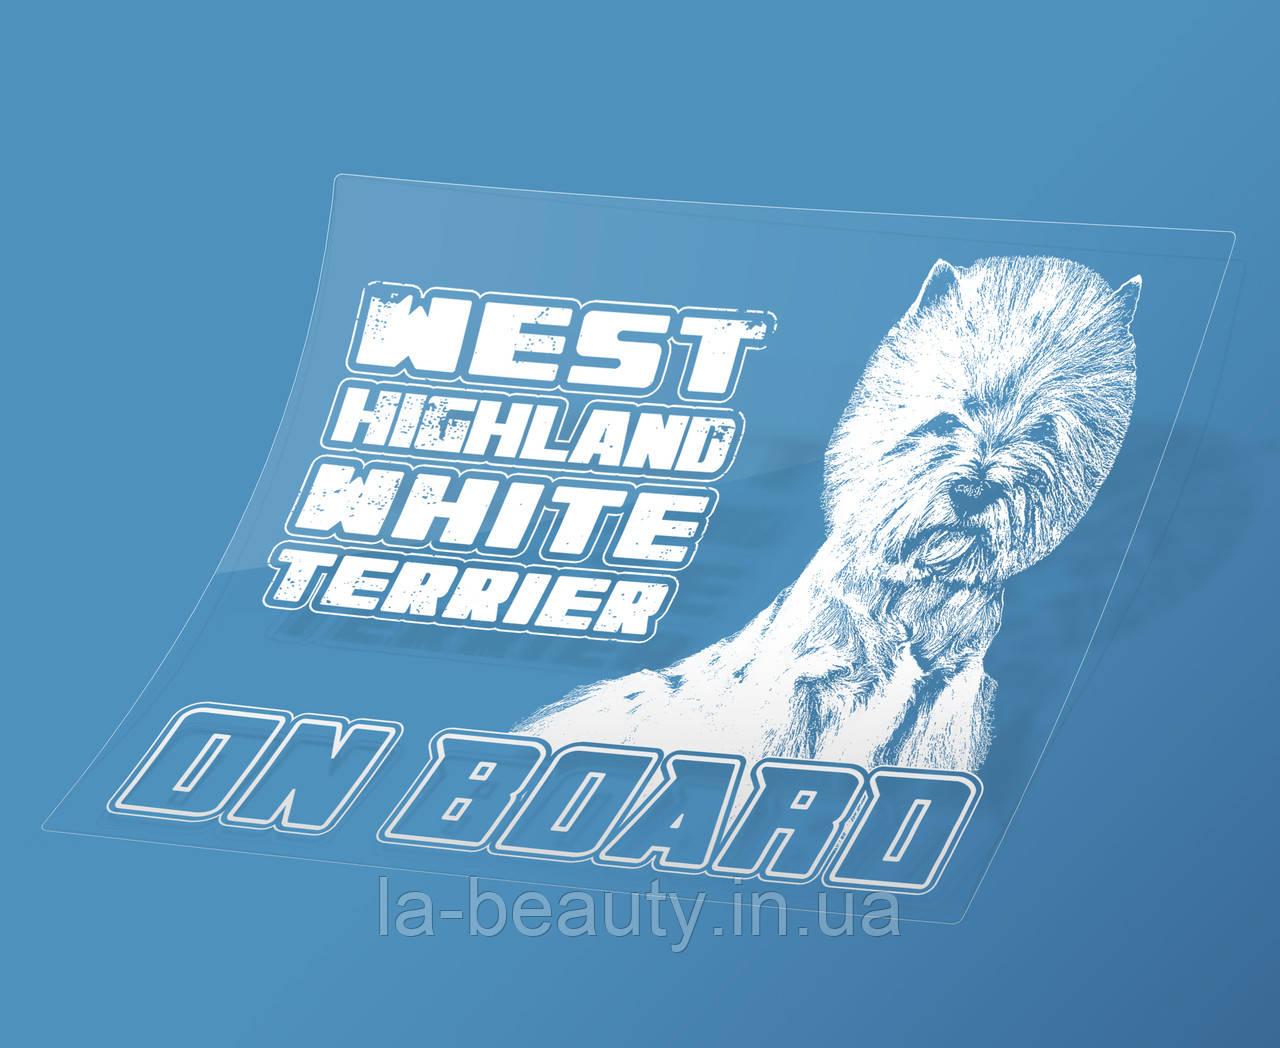 Наклейка на машину/авто Вест хайленд уайт терьер на борту (West Highland White Terrier on Board)